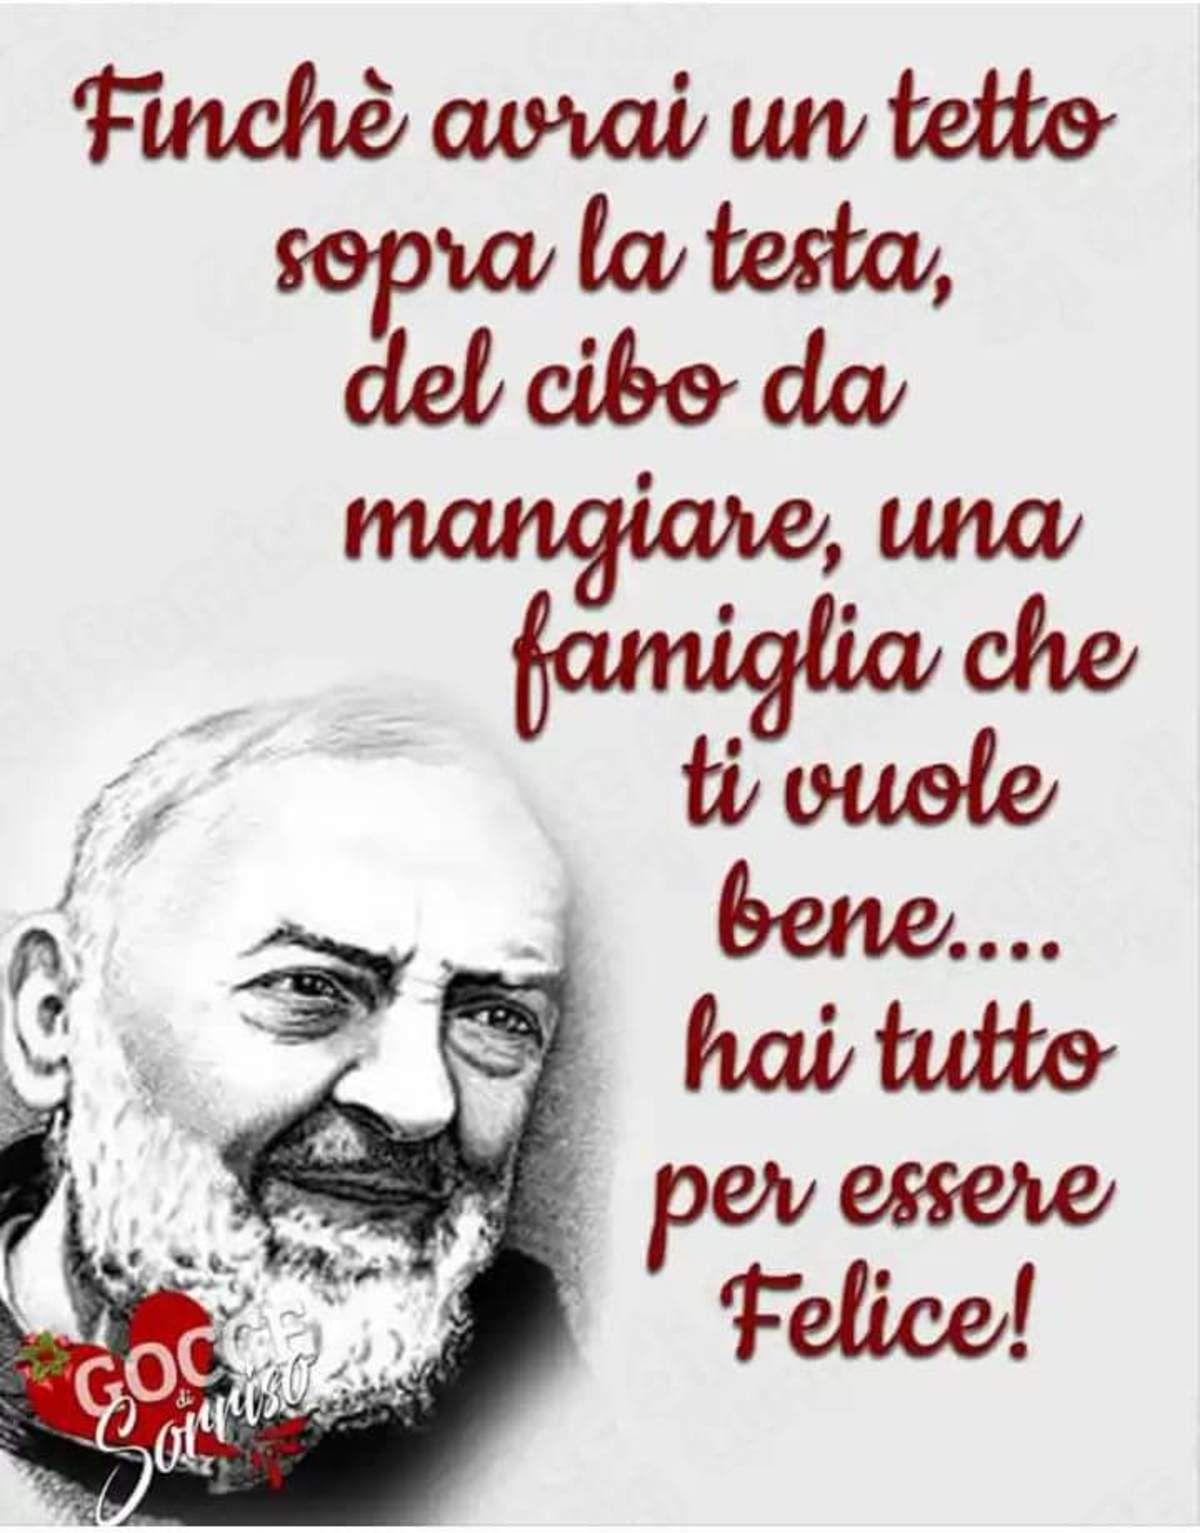 Immagini Belle Di Padre Pio Citazioni Carine Citazioni Padri